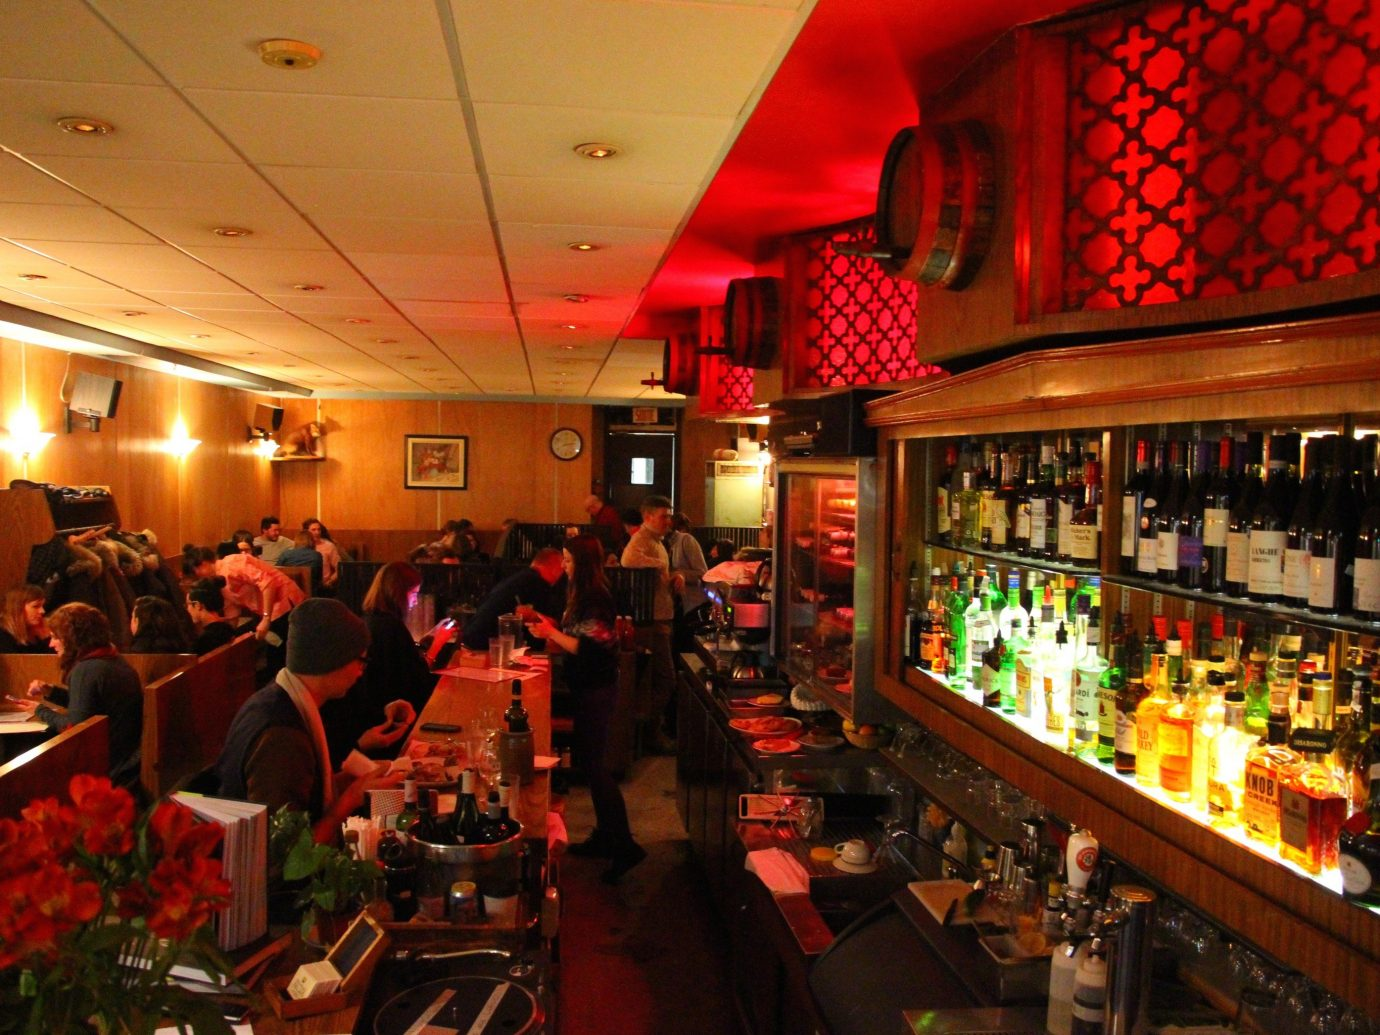 Food + Drink indoor ceiling person Bar restaurant meal several